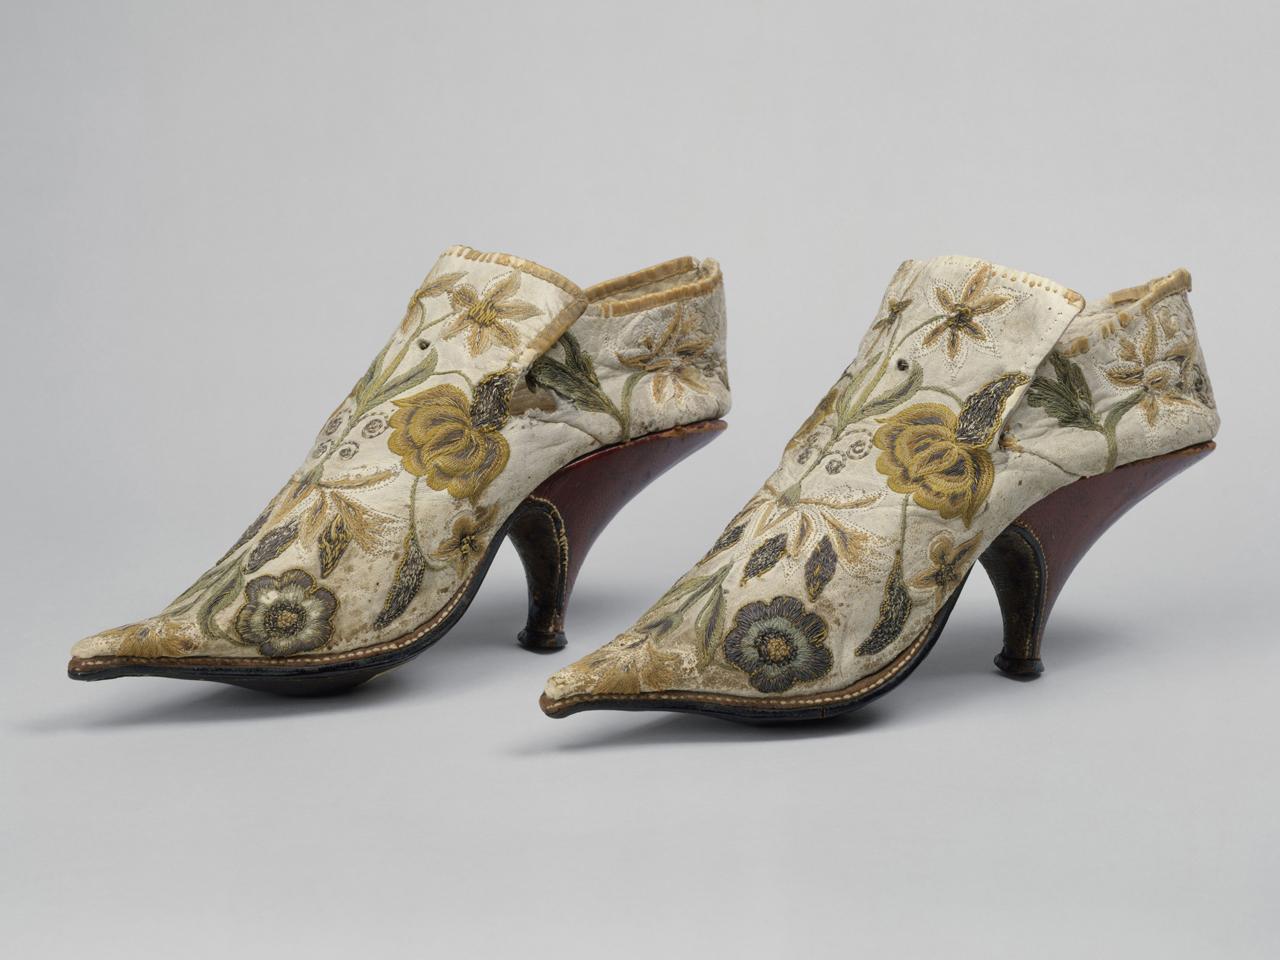 High Heels History